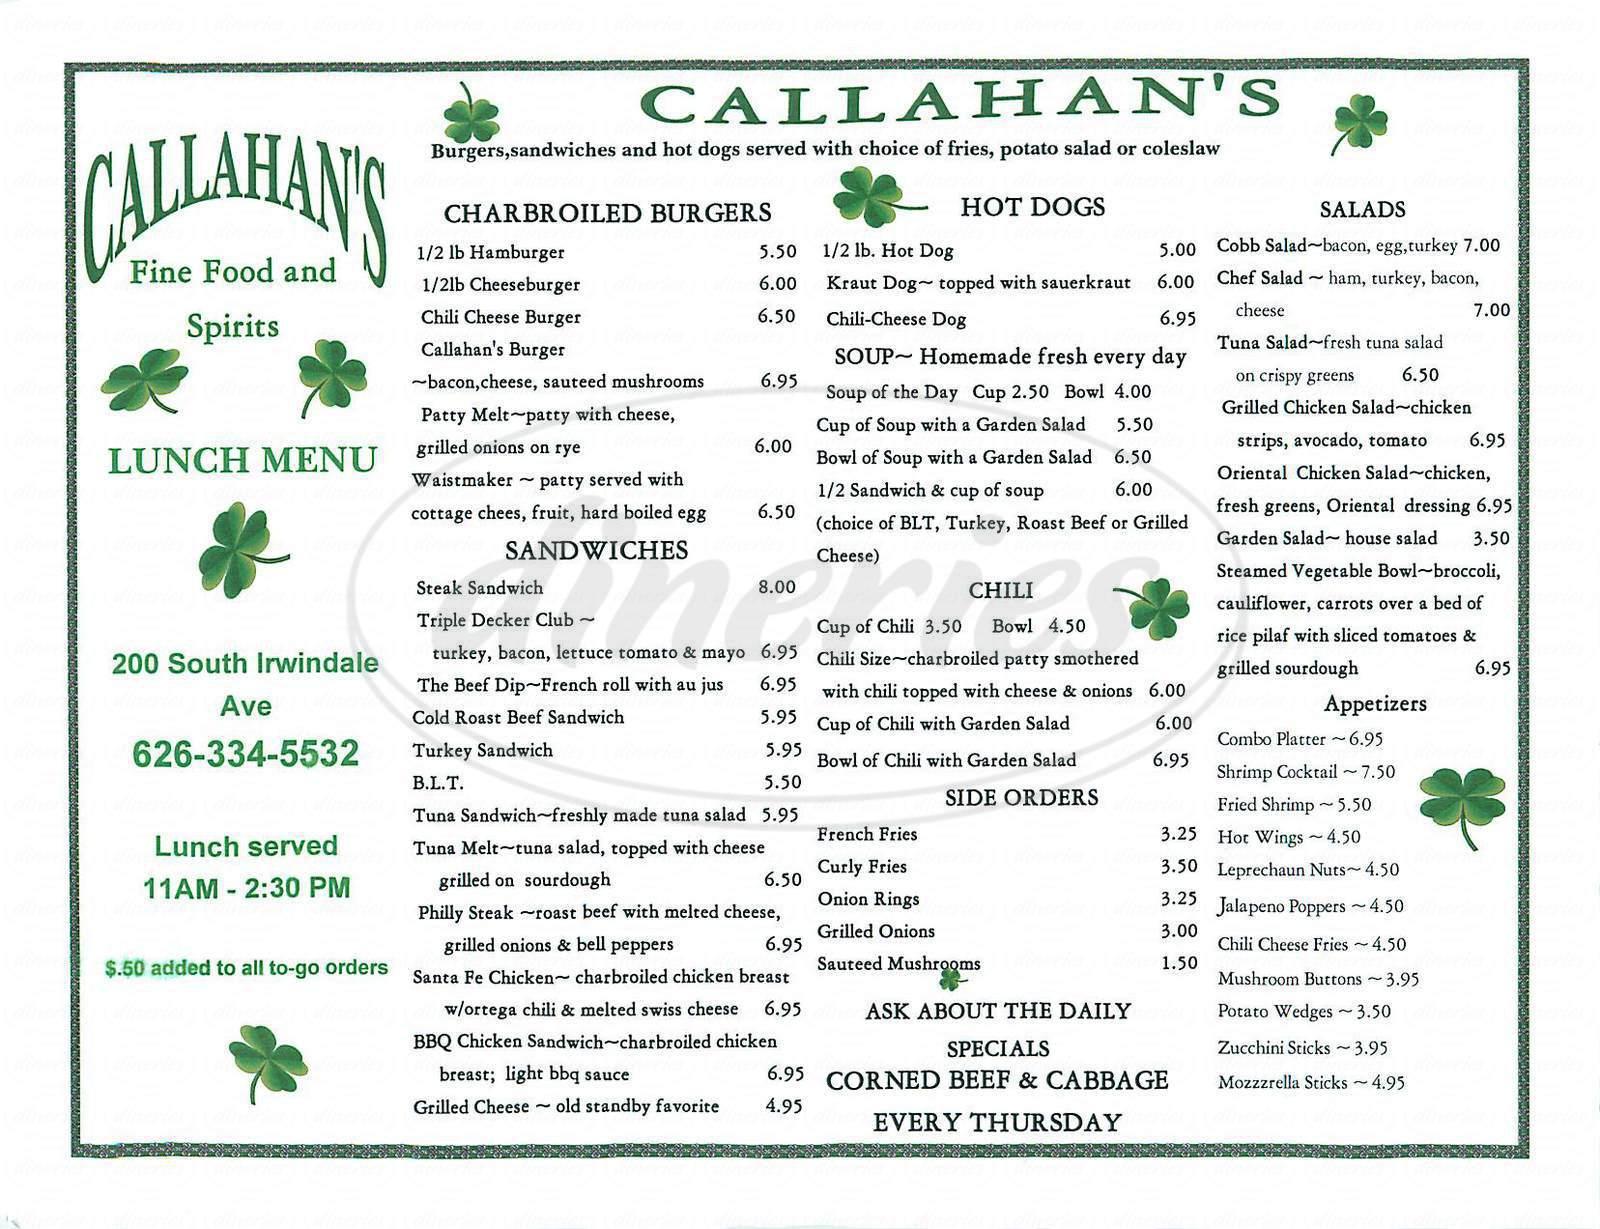 menu for Callahans